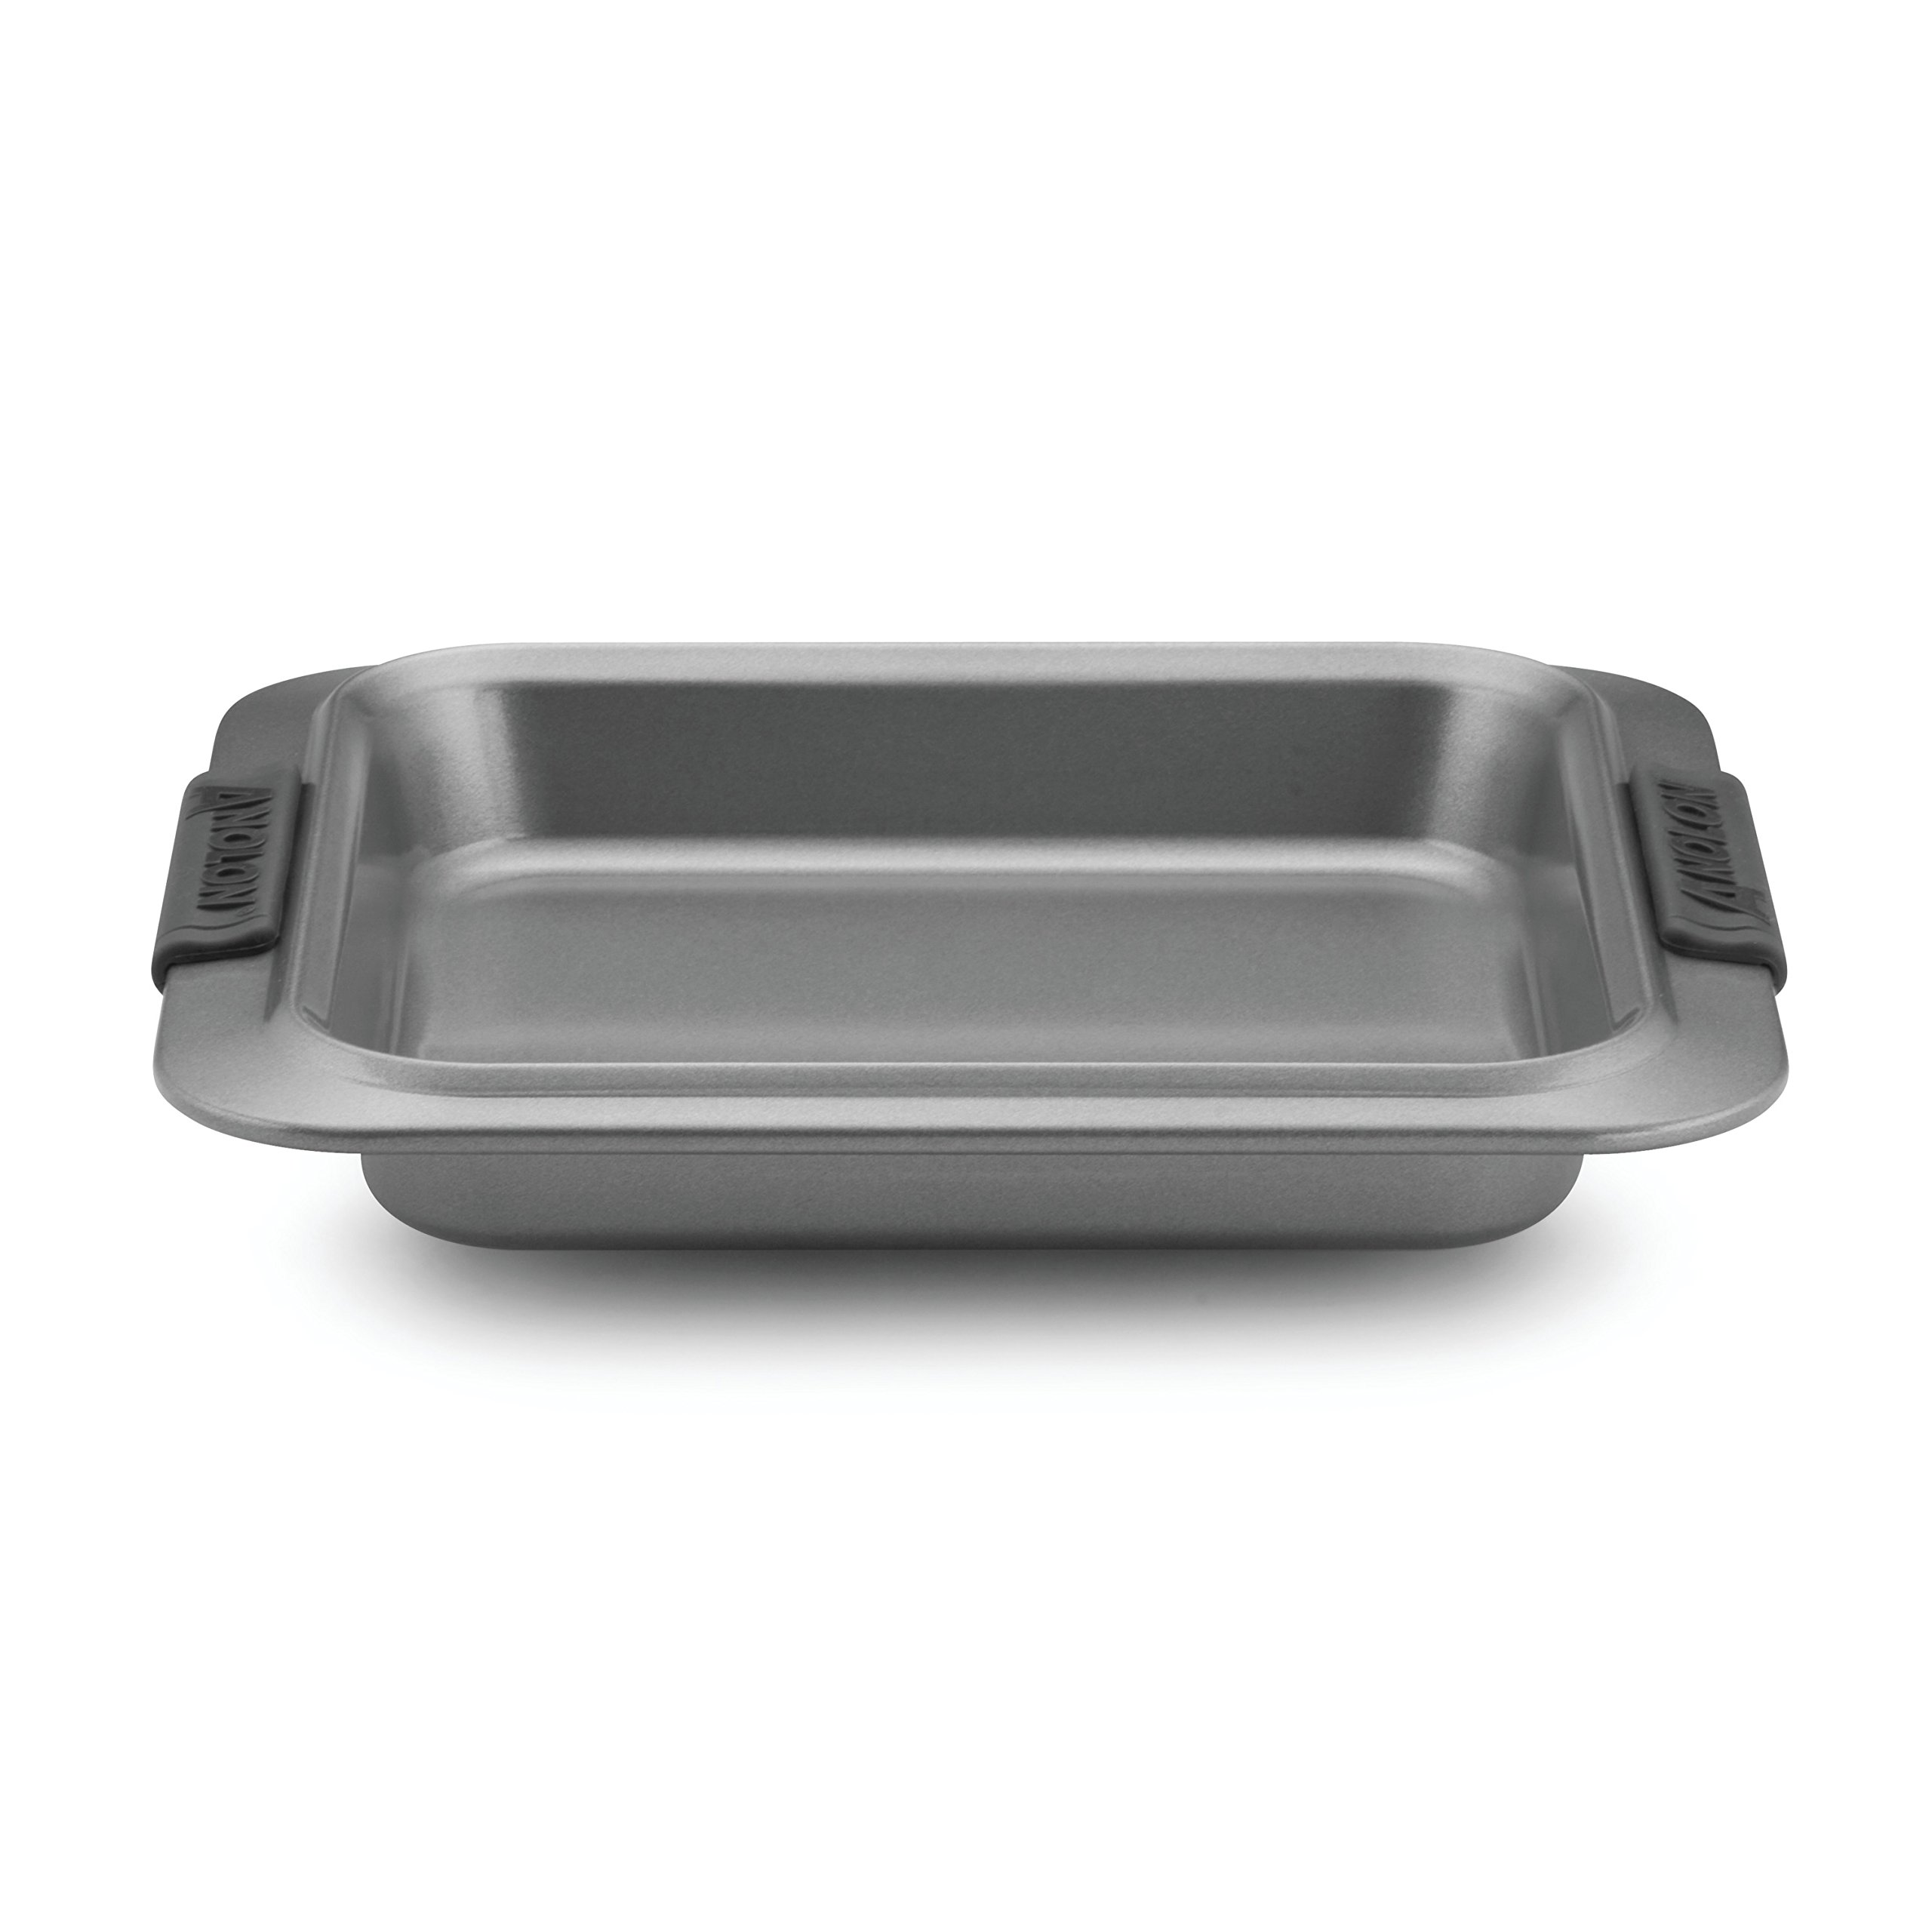 Anolon Advanced Nonstick Bakeware 9-Inch Square Cake Pan